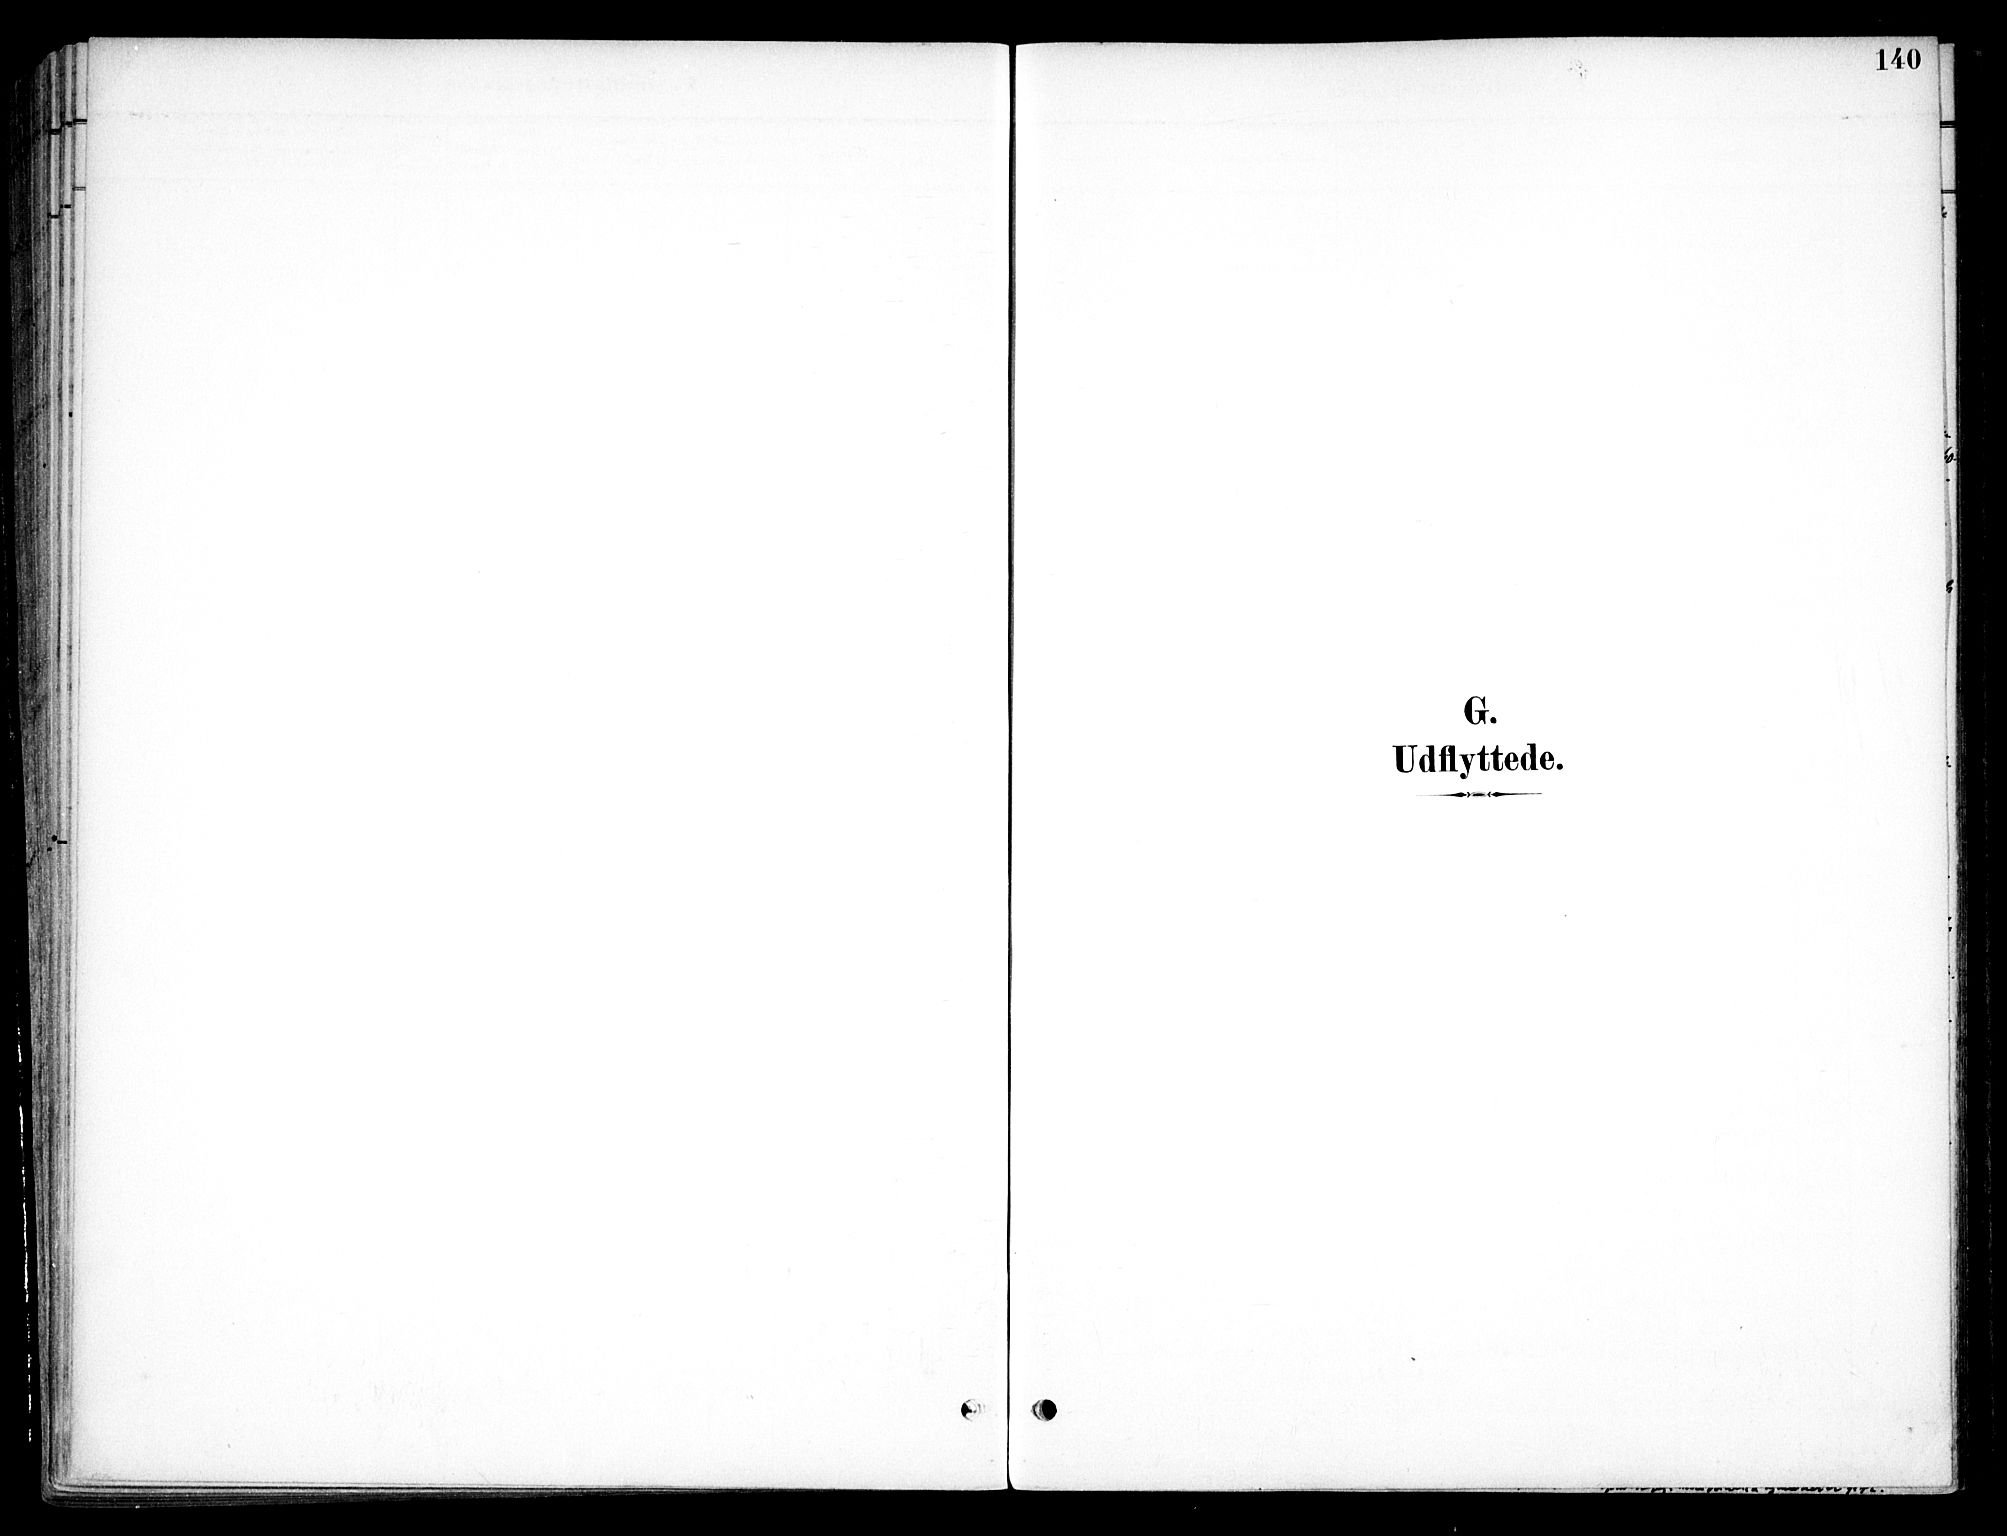 SAO, Nannestad prestekontor Kirkebøker, F/Fc/L0002: Ministerialbok nr. III 2, 1893-1907, s. 140